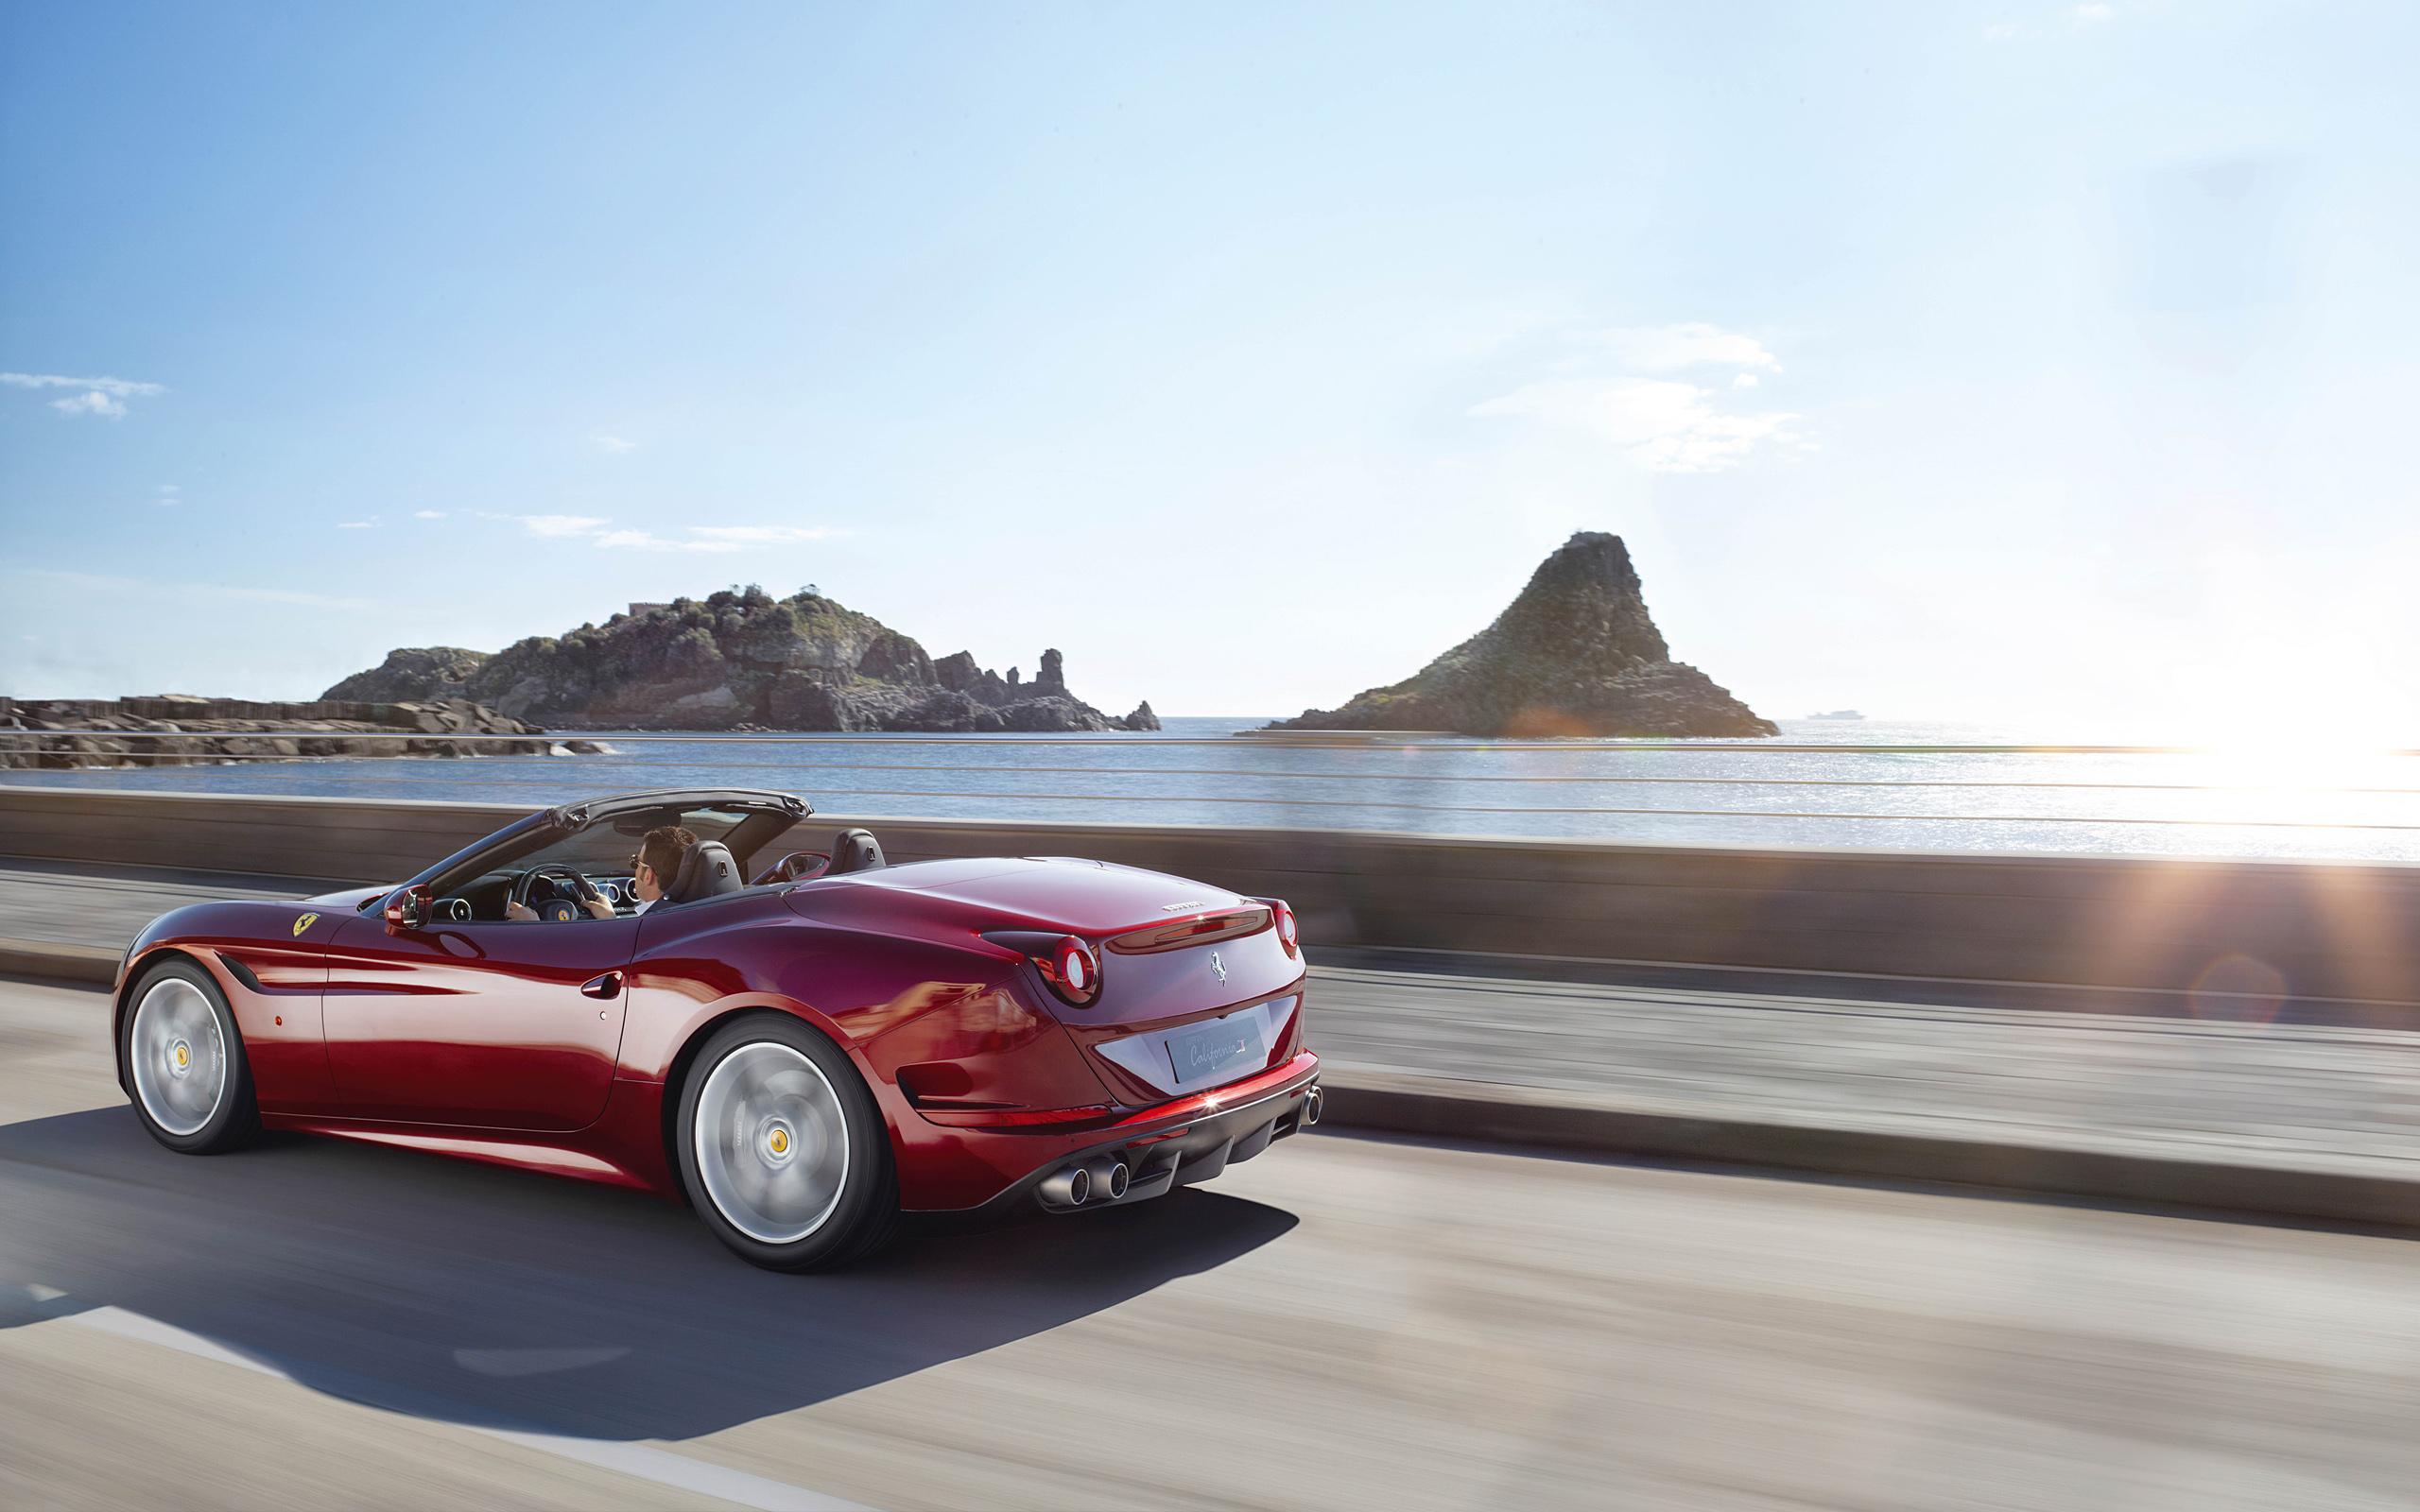 Ferrari california t wallpapers pictures images ferrari california t widescreen wallpaper 2560x1600 voltagebd Gallery